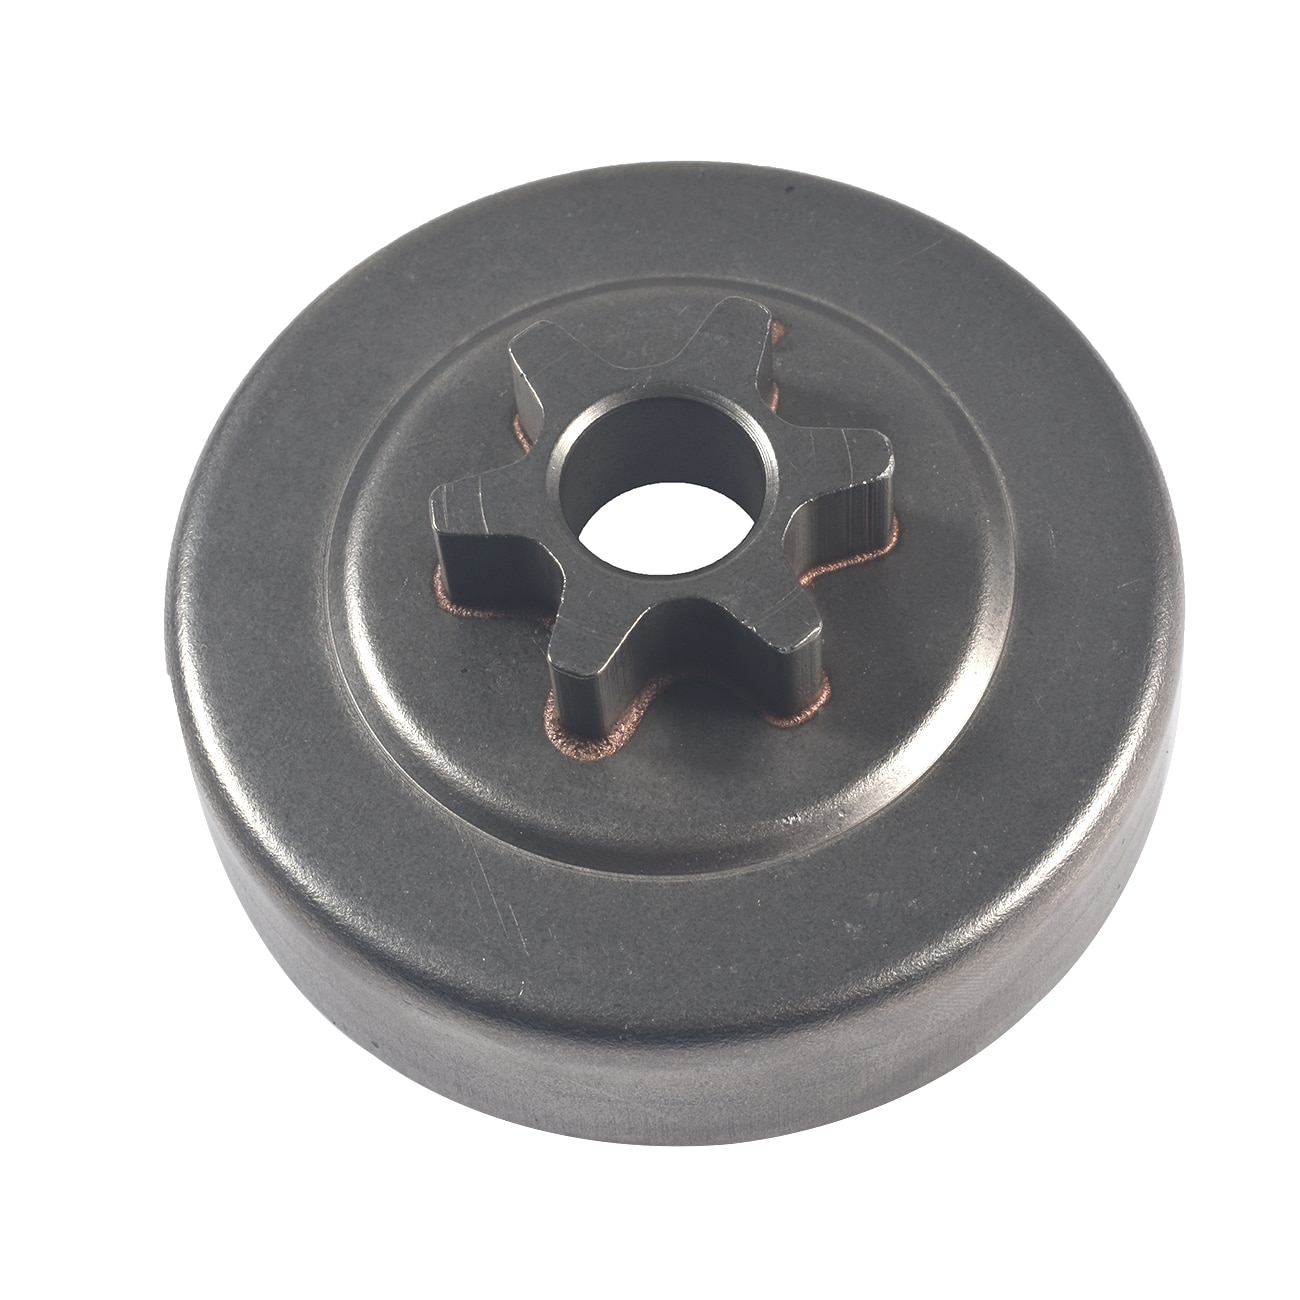 3 8 clutch drum 6T 3/8 Clutch Drum Fits Stihl chainsaw 017, 018, 021, 023, 025, MS170, MS180